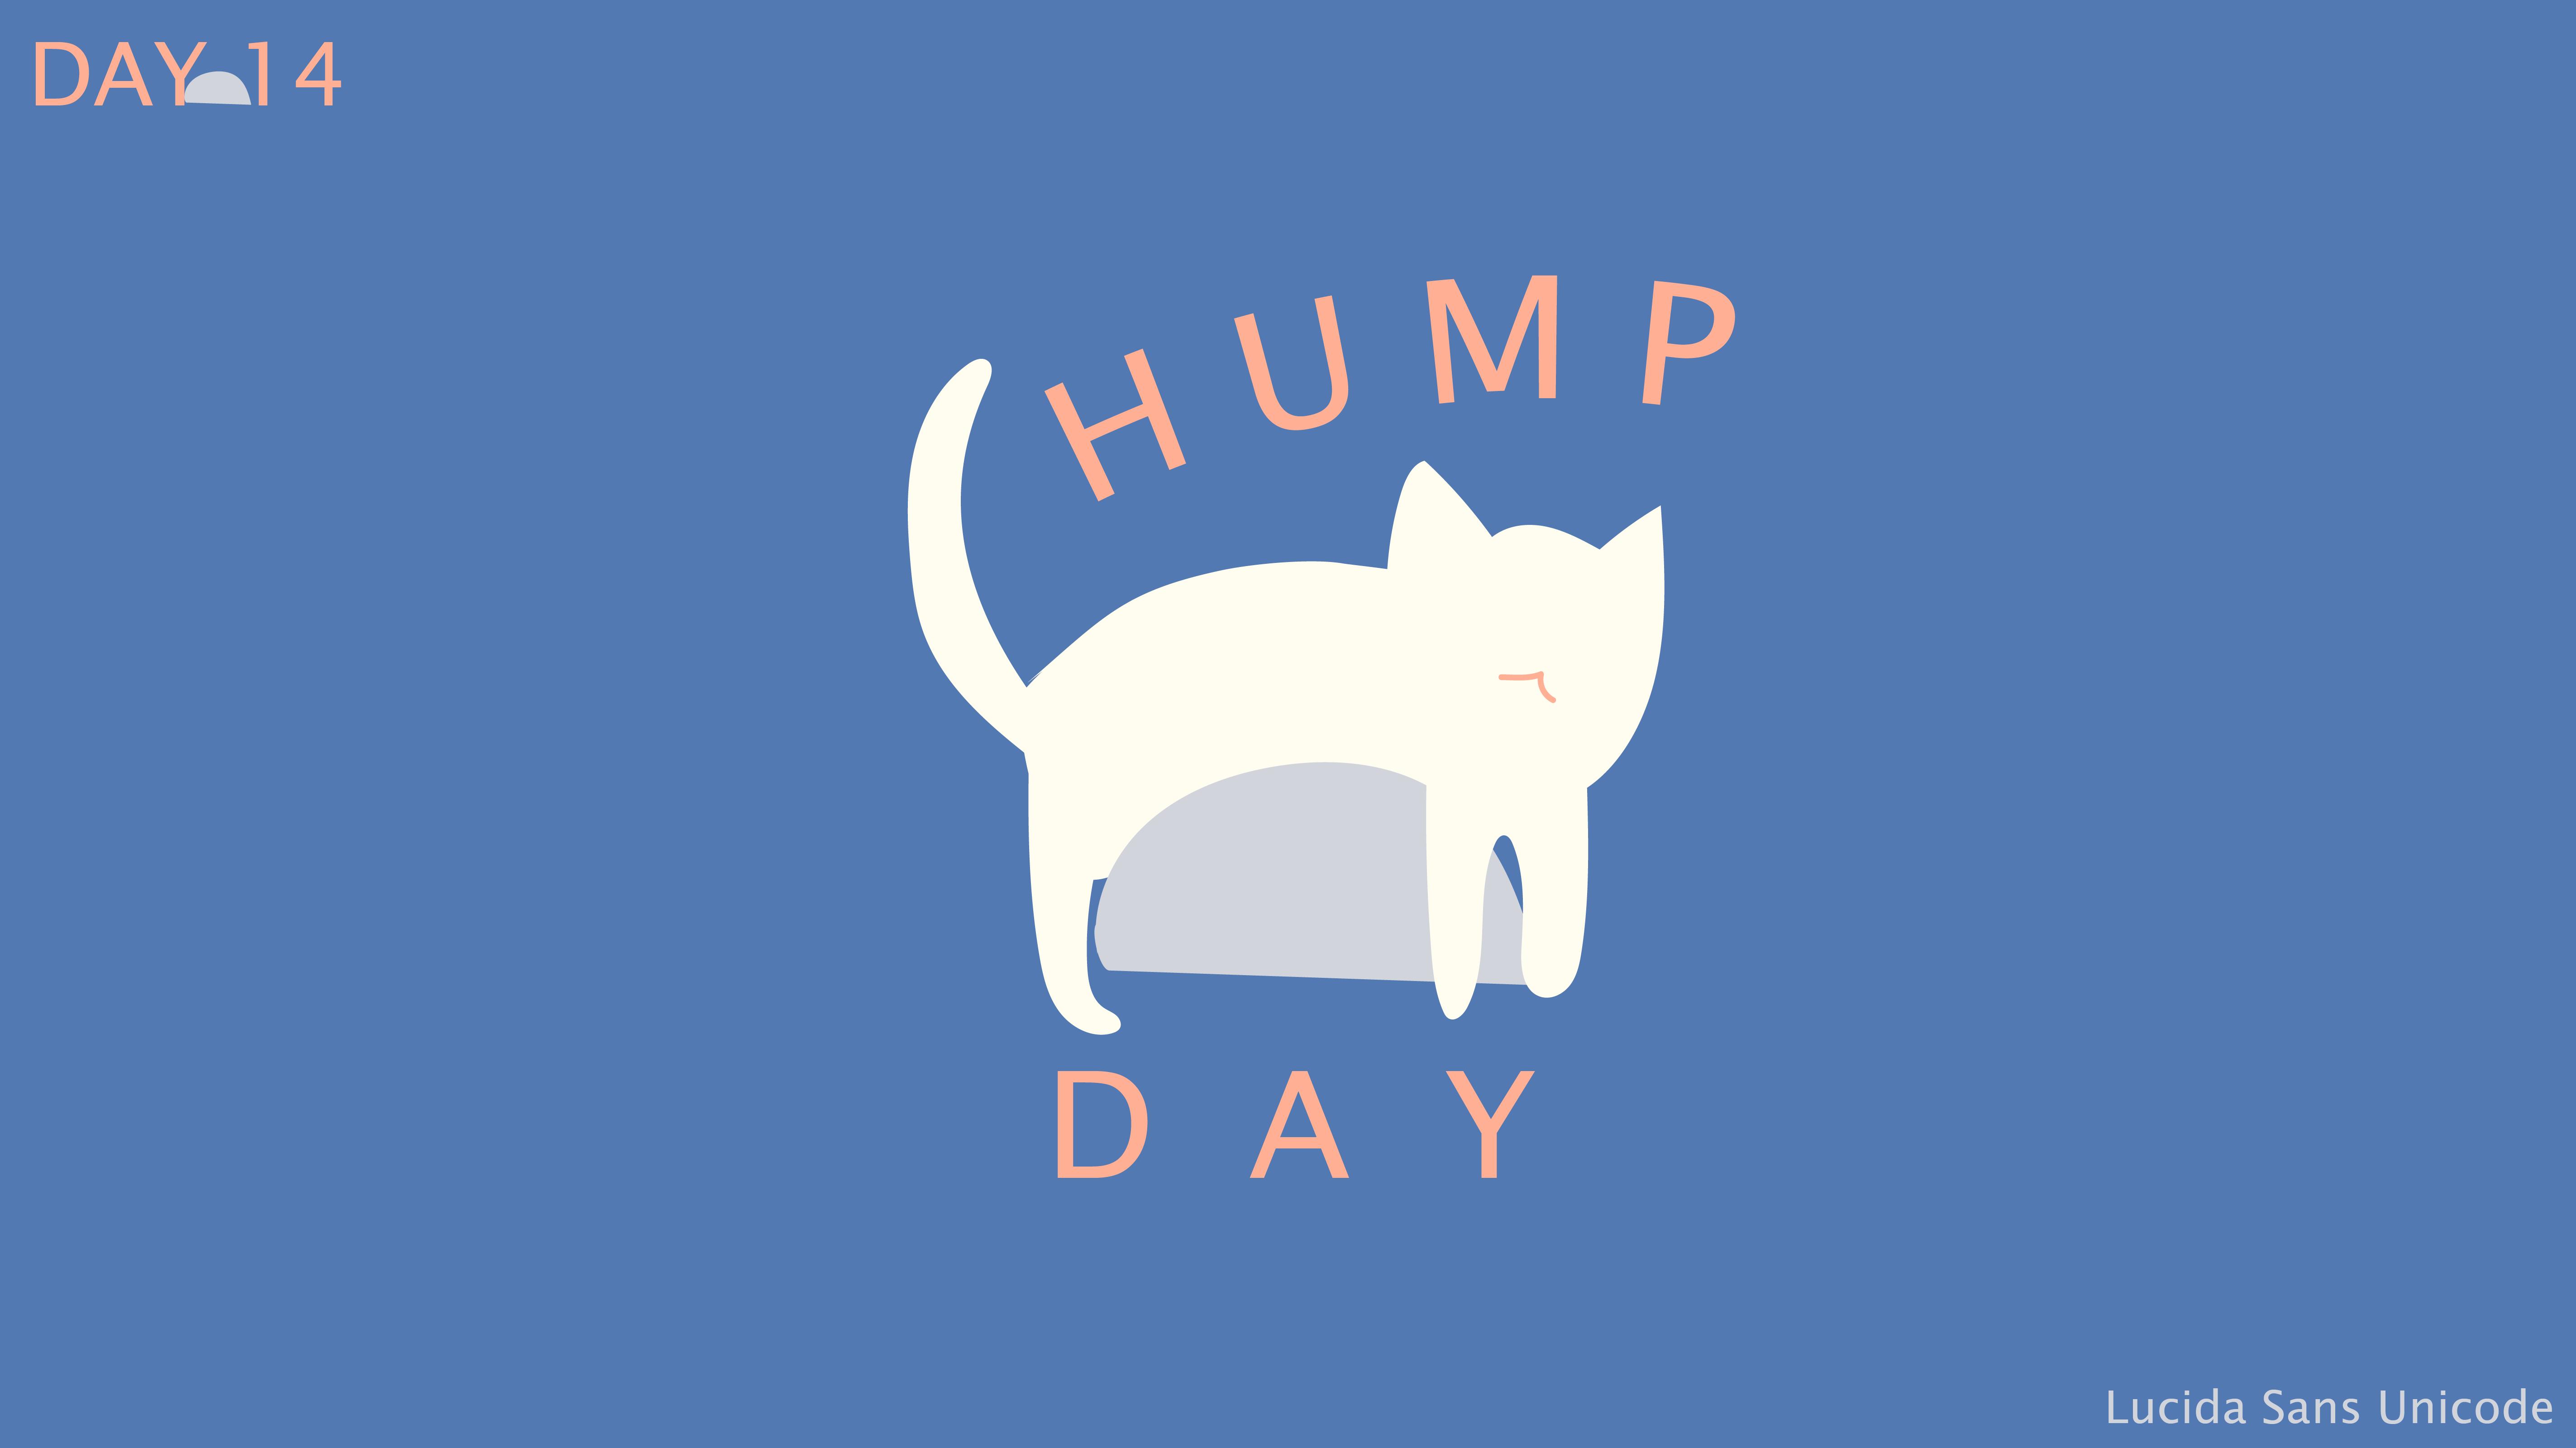 [cat]day1-14